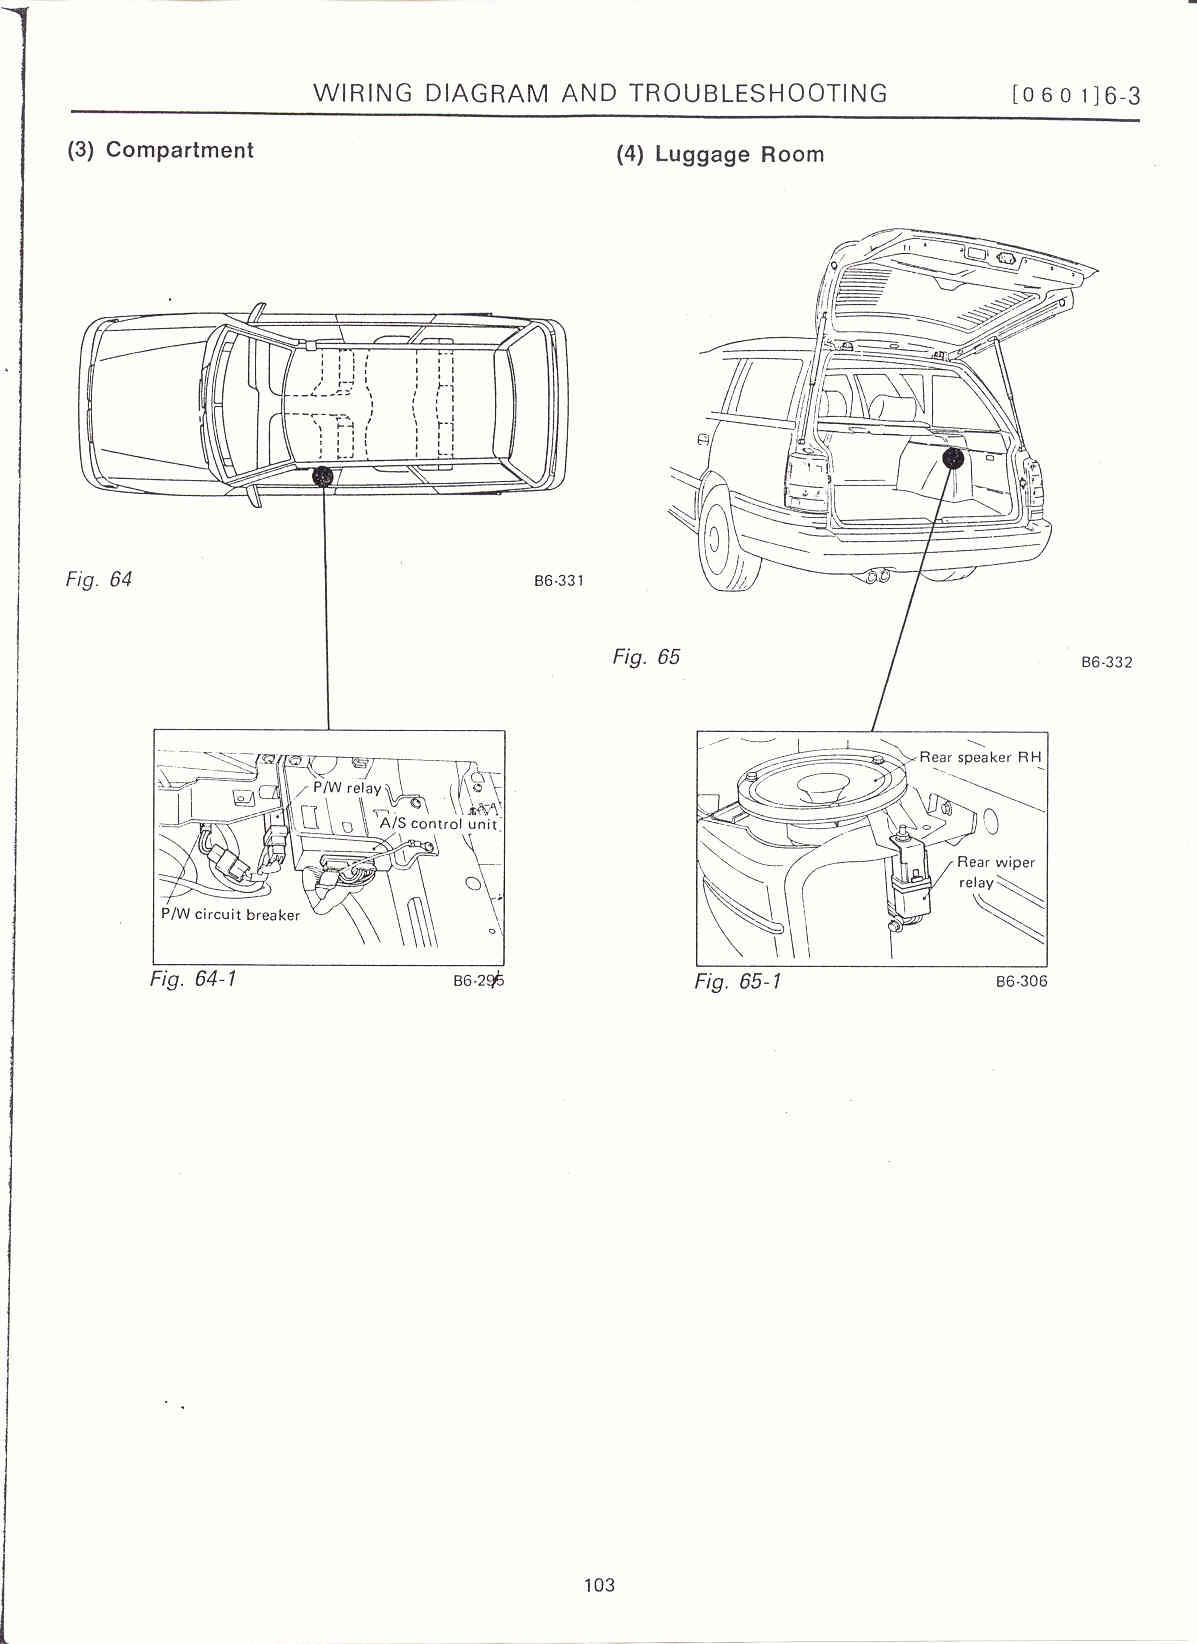 Surrealmirage Subaru Legacy Swap Electrical Info Notes Ej22 Engine Diagram Compartment Luggage Room